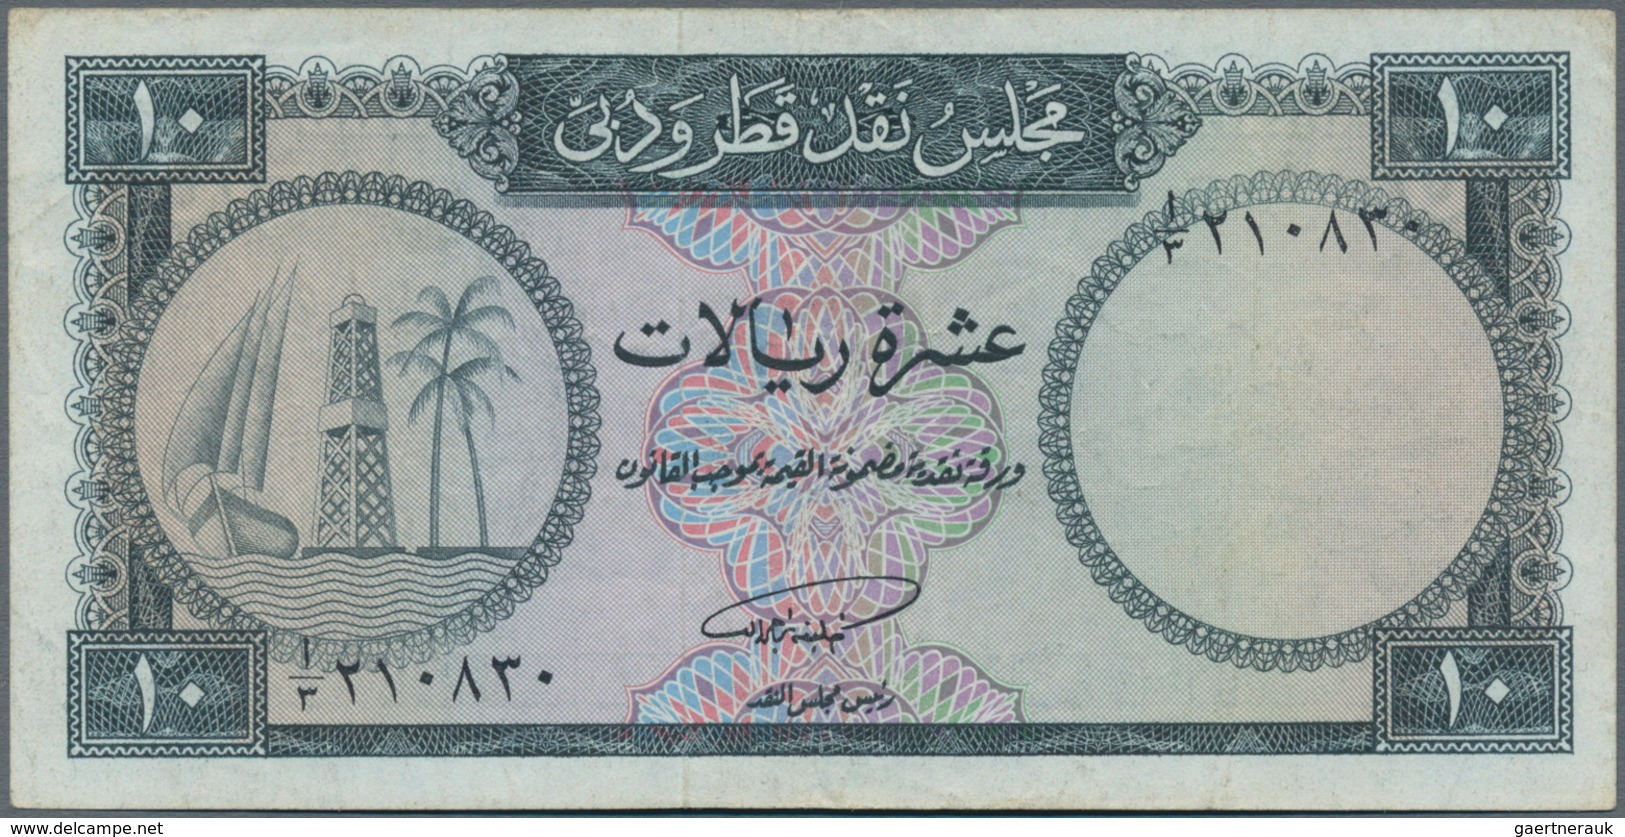 Qatar & Dubai: 10 Riyals ND(1960's), P.3, Nice Original Shape With A Few Spots And Several Folds. Co - United Arab Emirates